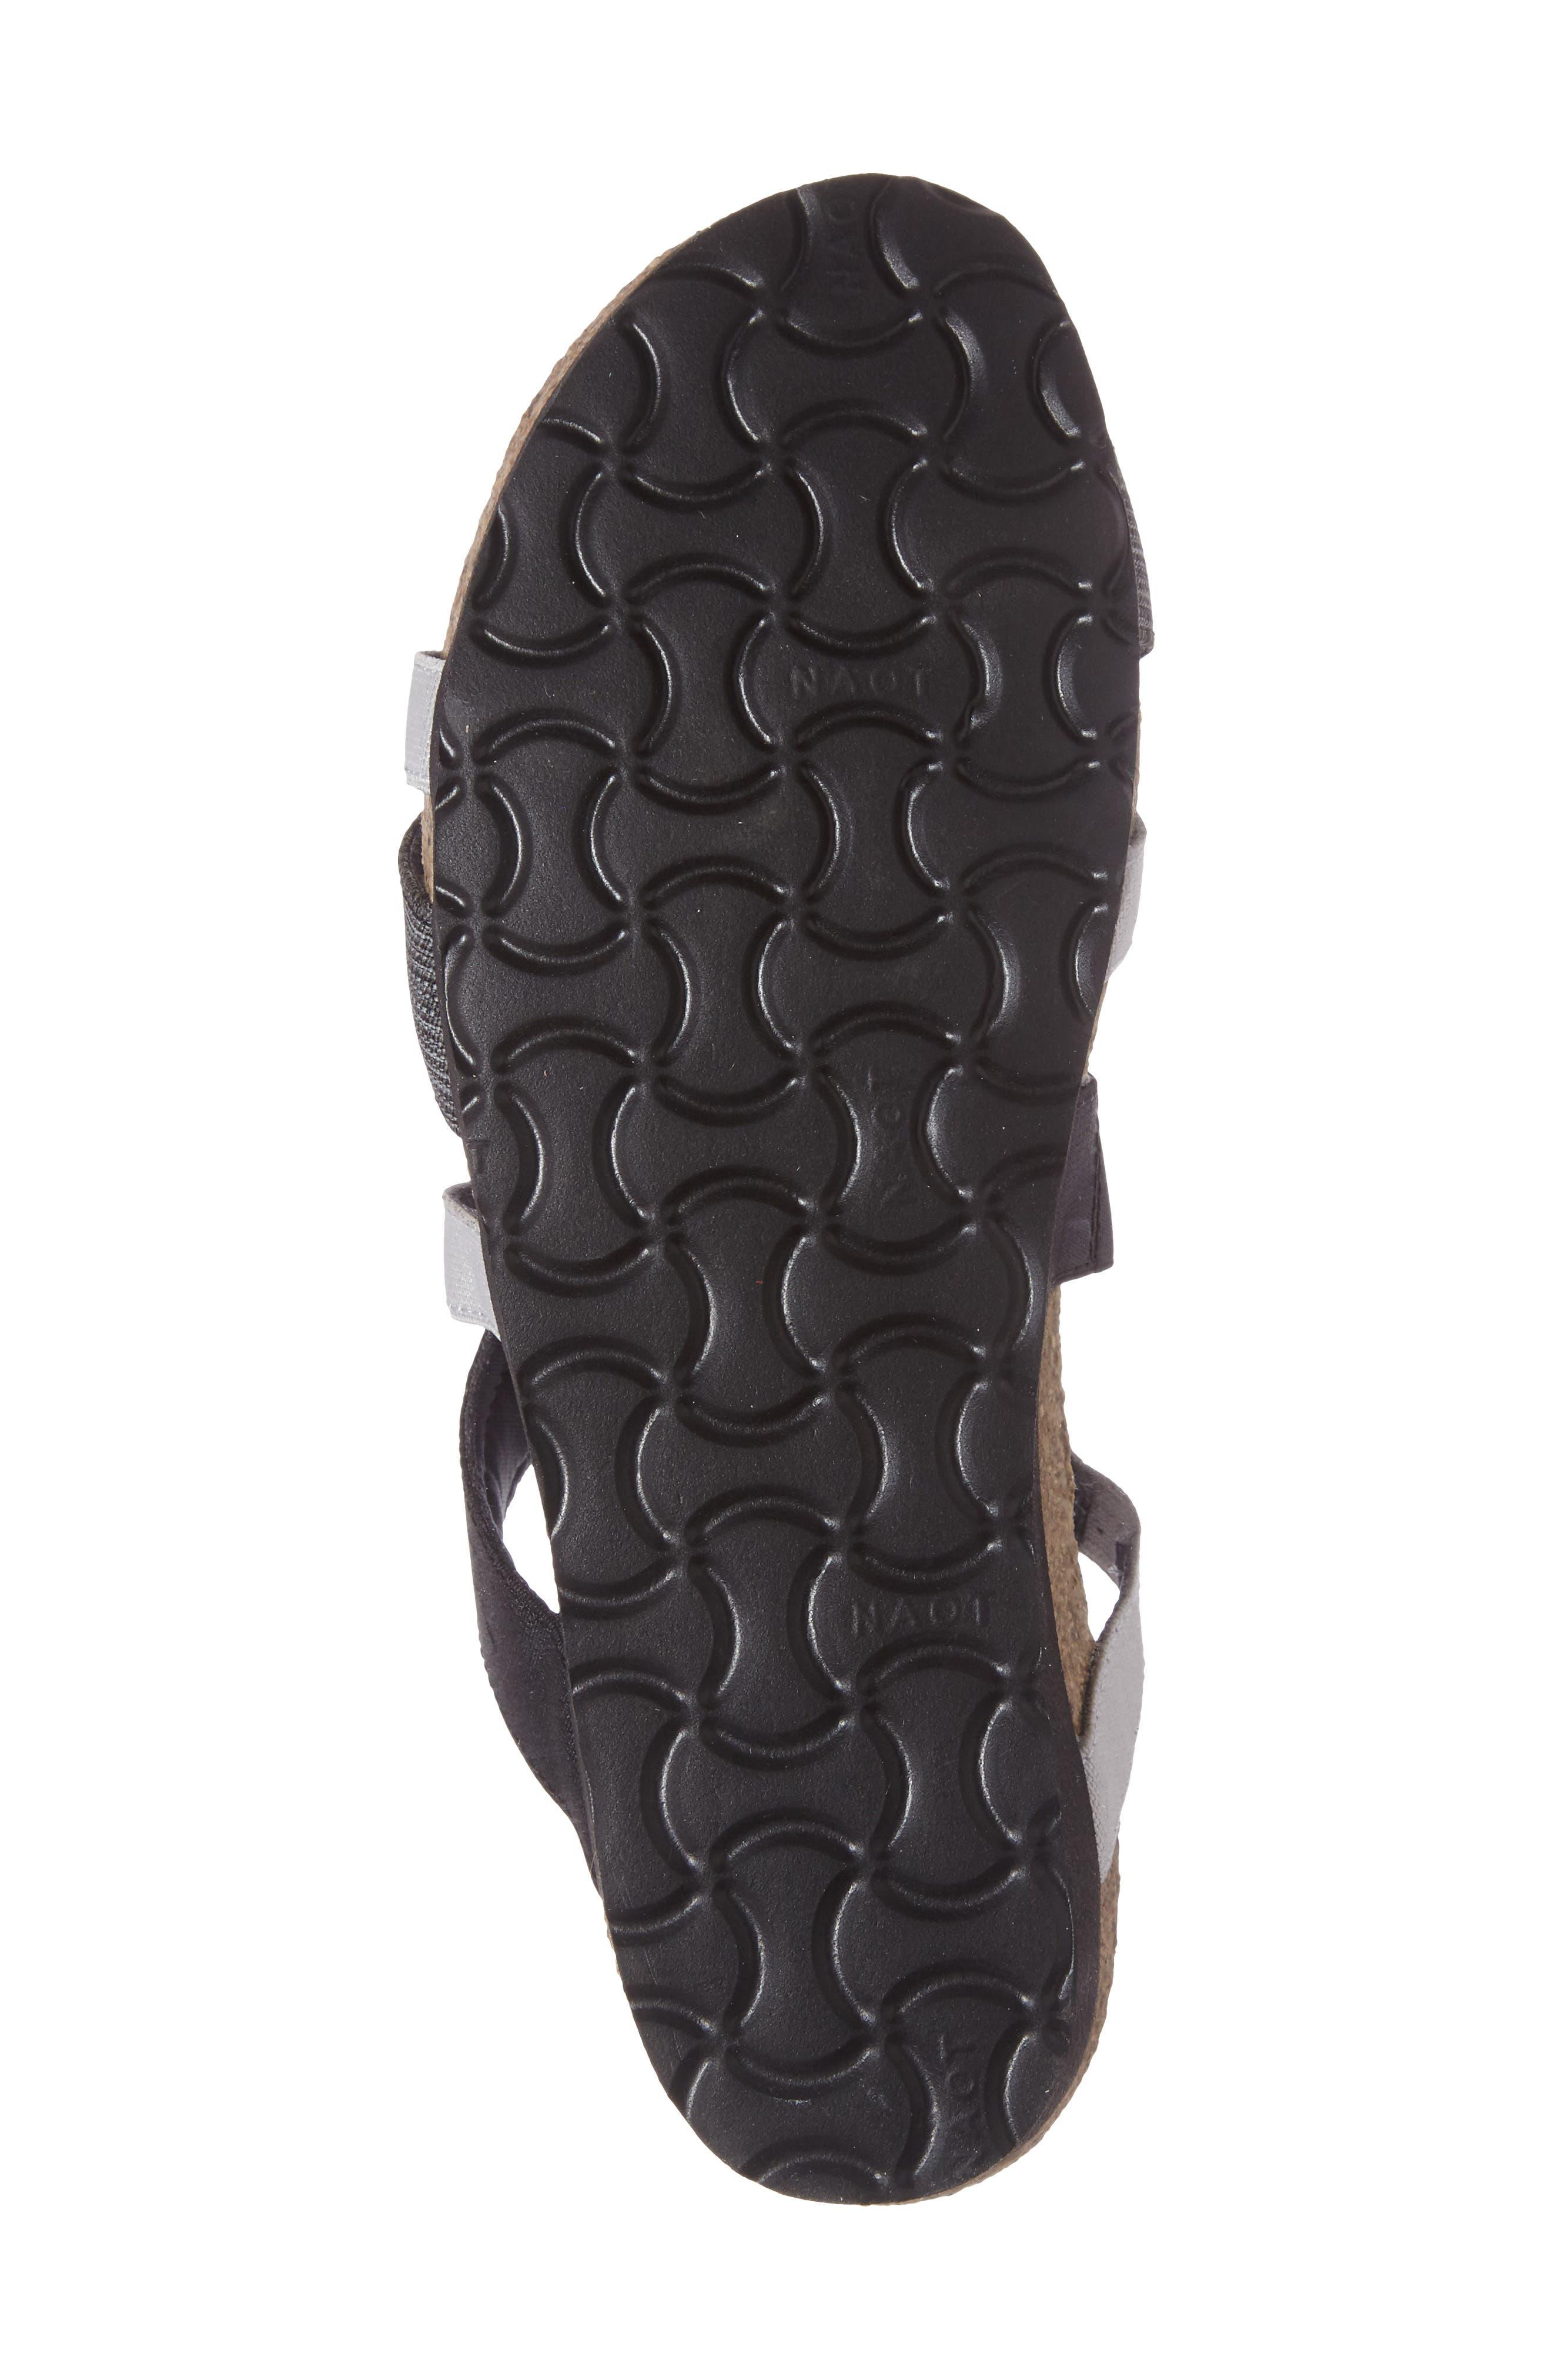 NAOT, Roxana Strappy Slip-On Sandal, Alternate thumbnail 4, color, BLACK/ GREY FABRIC